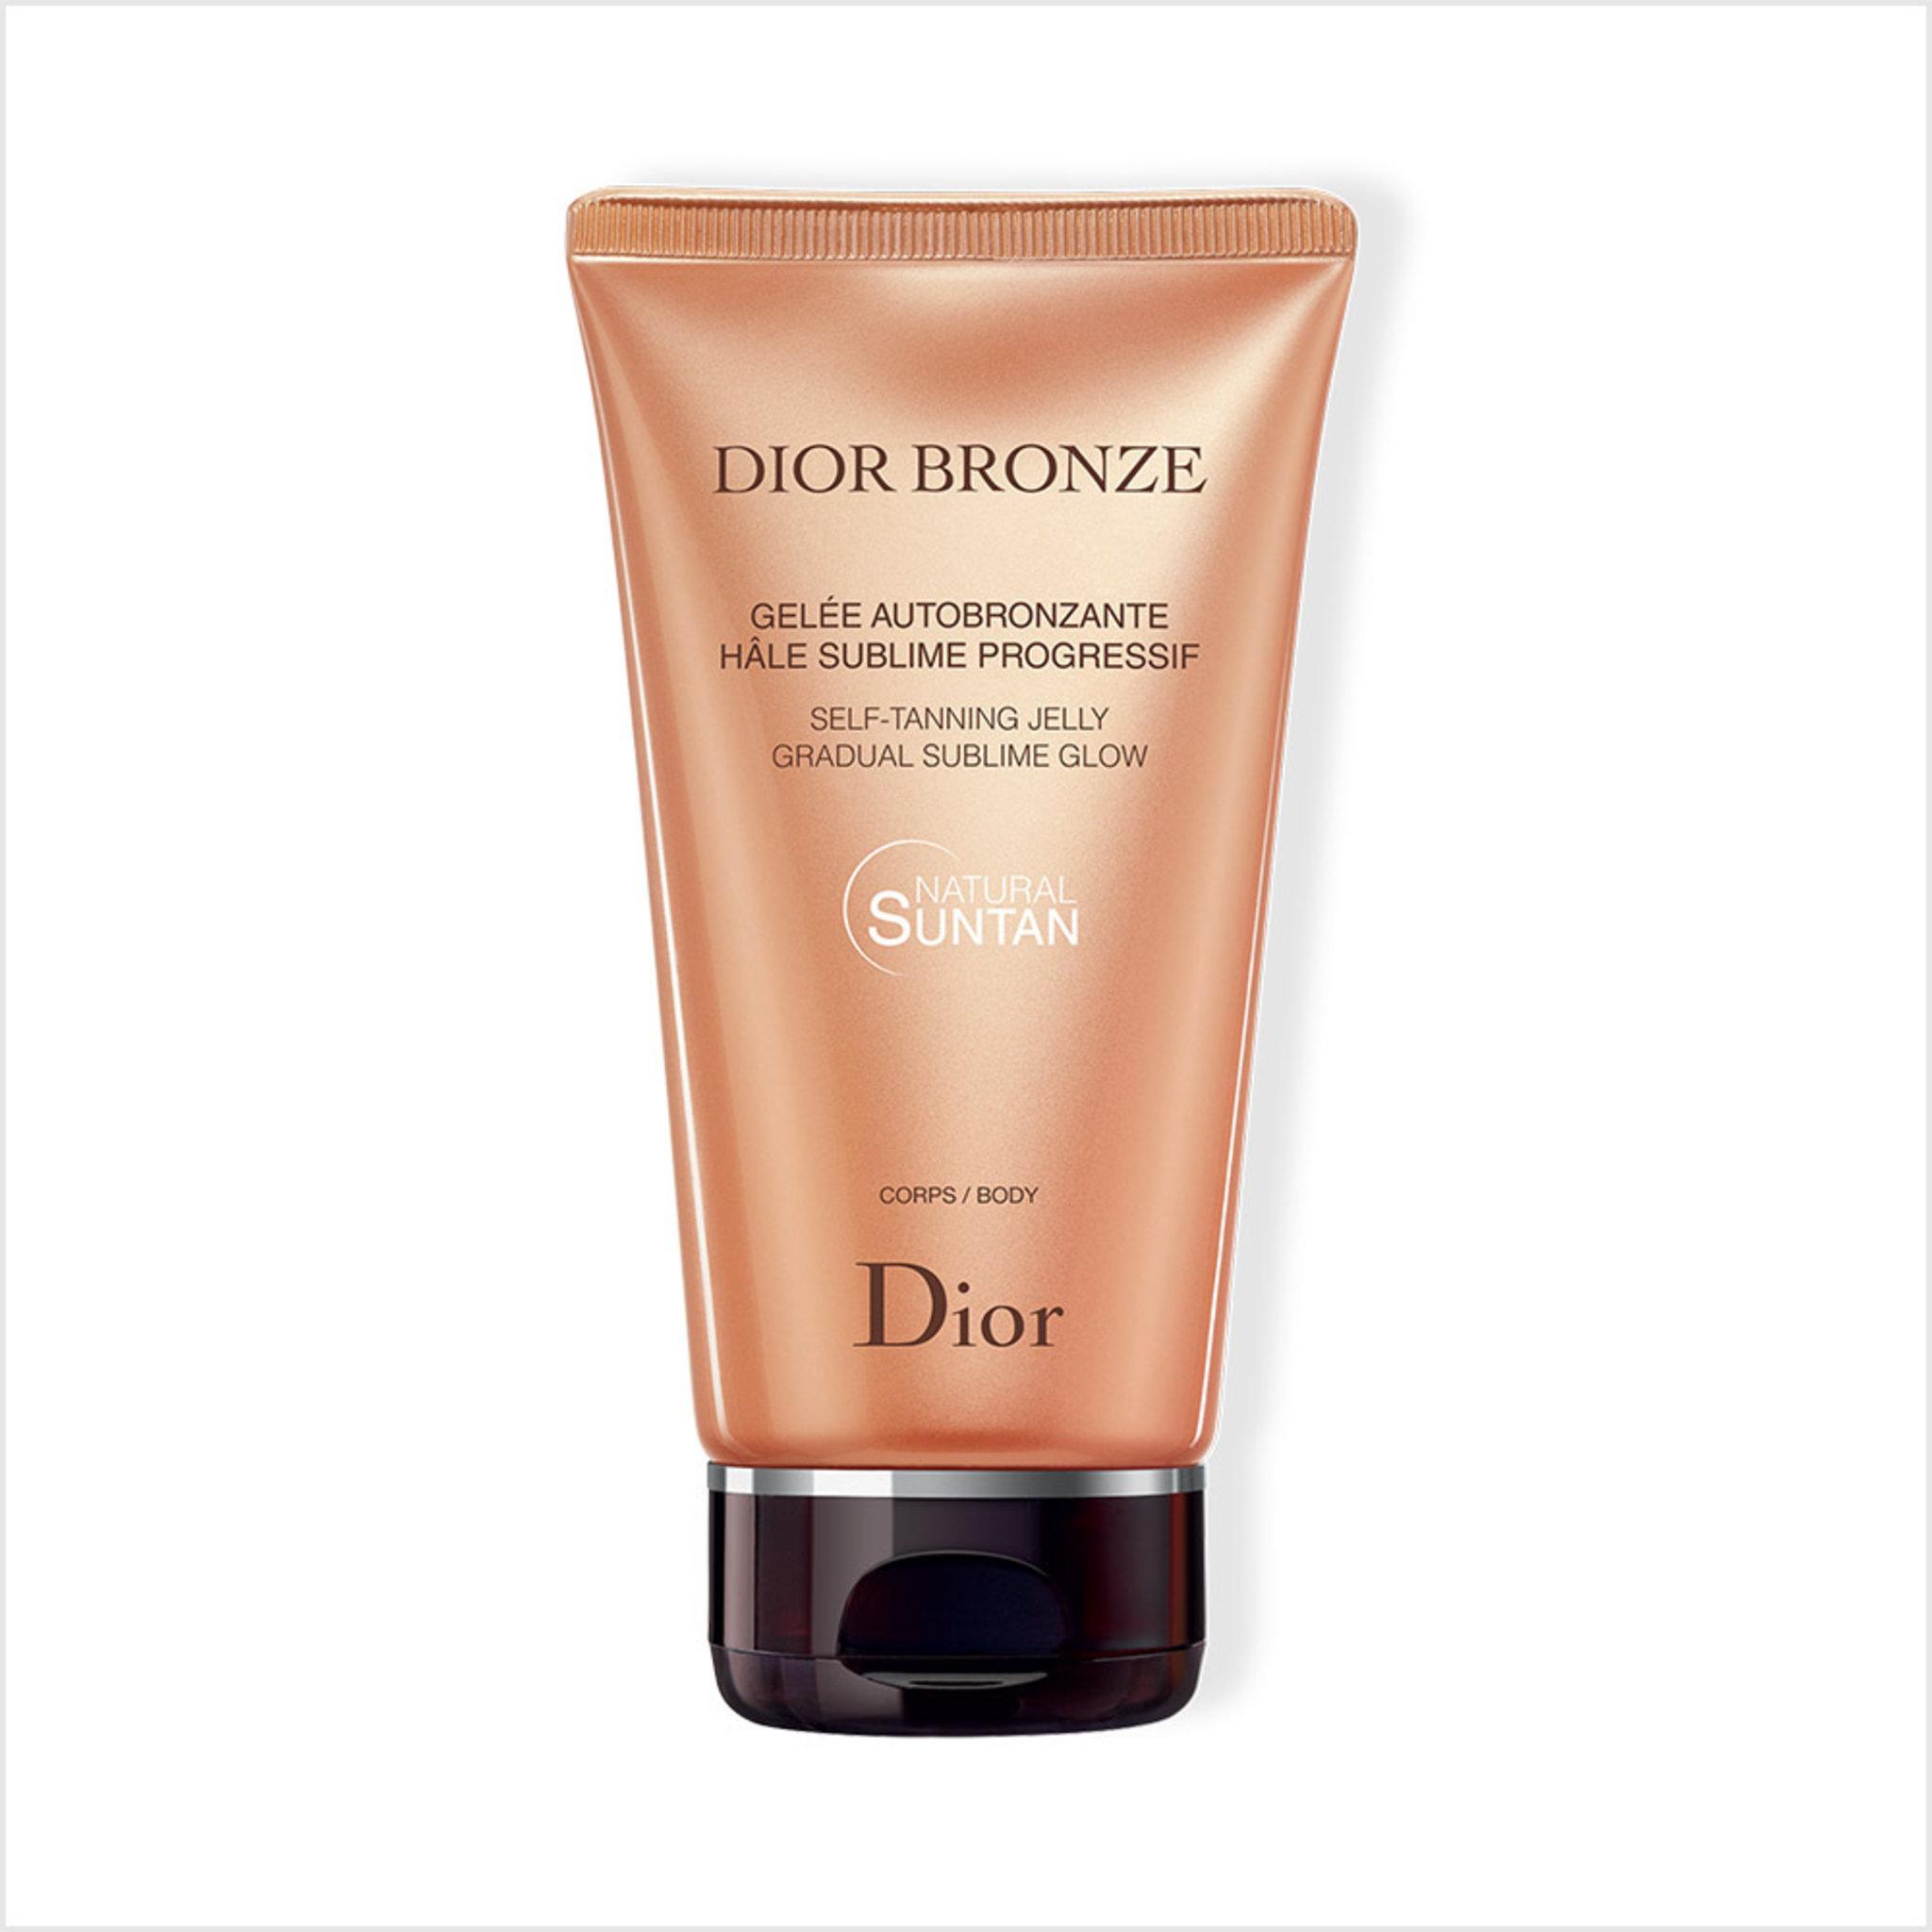 Dior Bronze Self Tanning Jelly Body, 150 ML